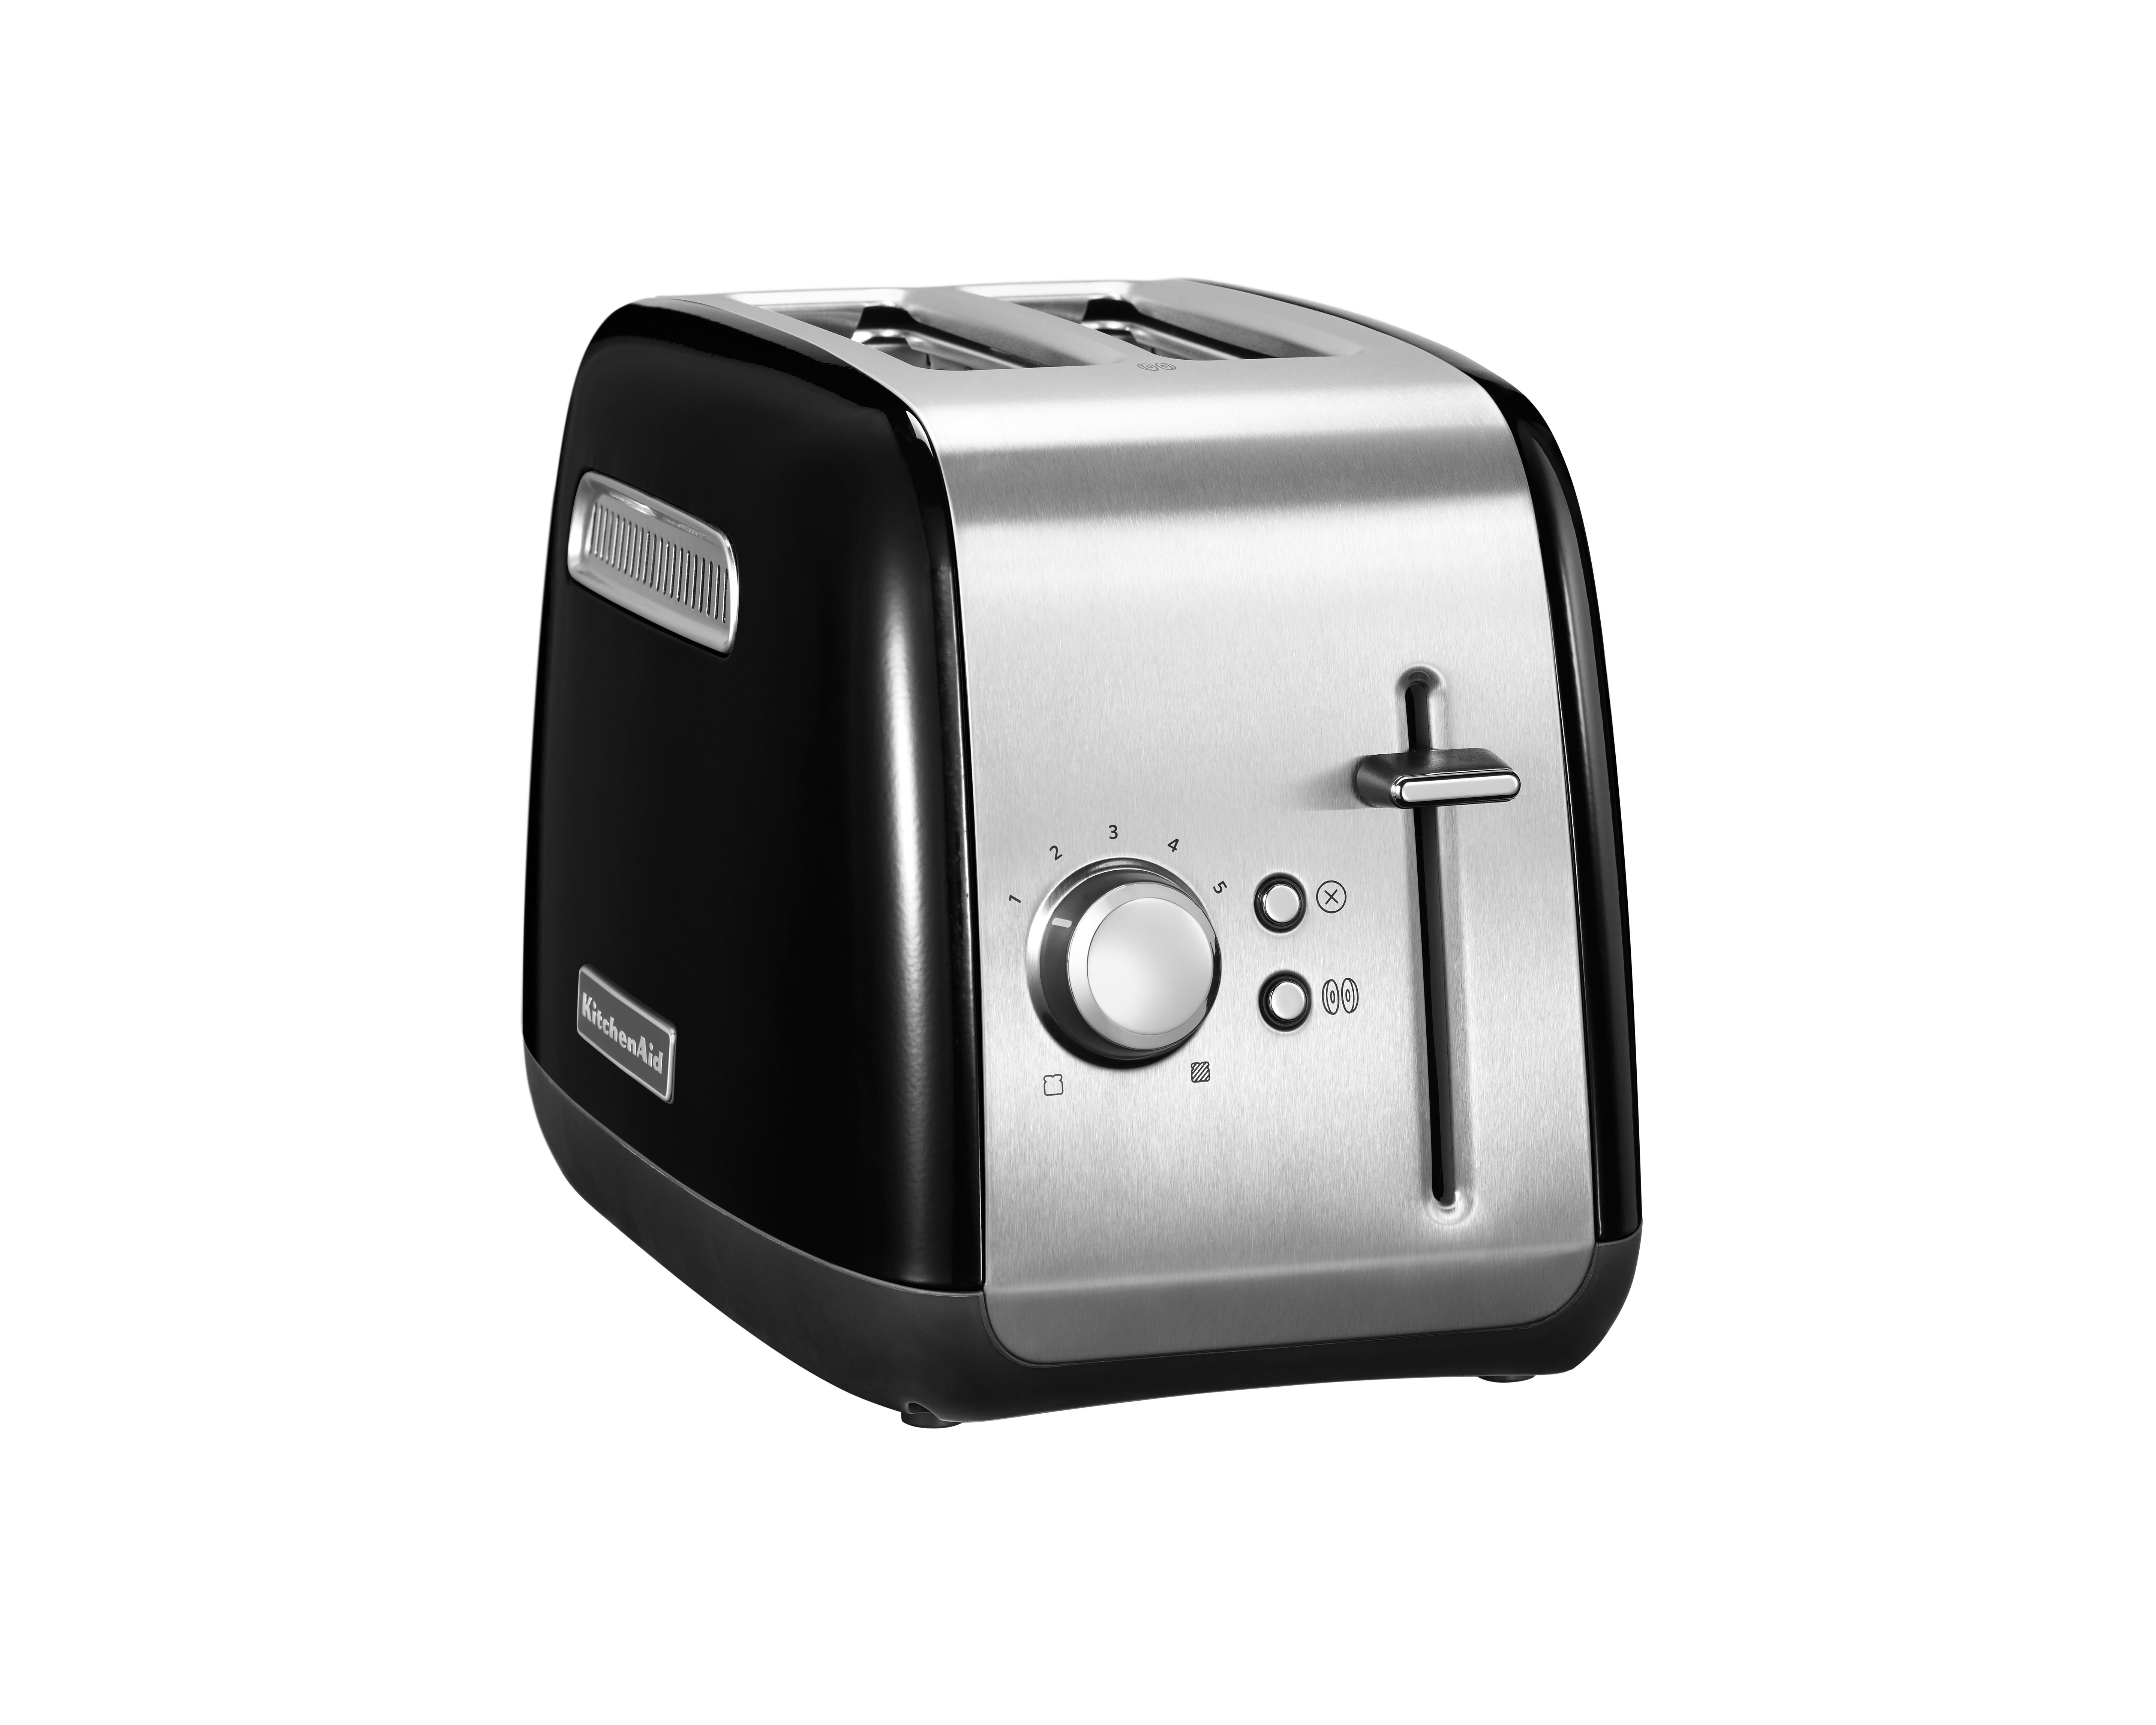 KitchenAid Classic toaster, sort